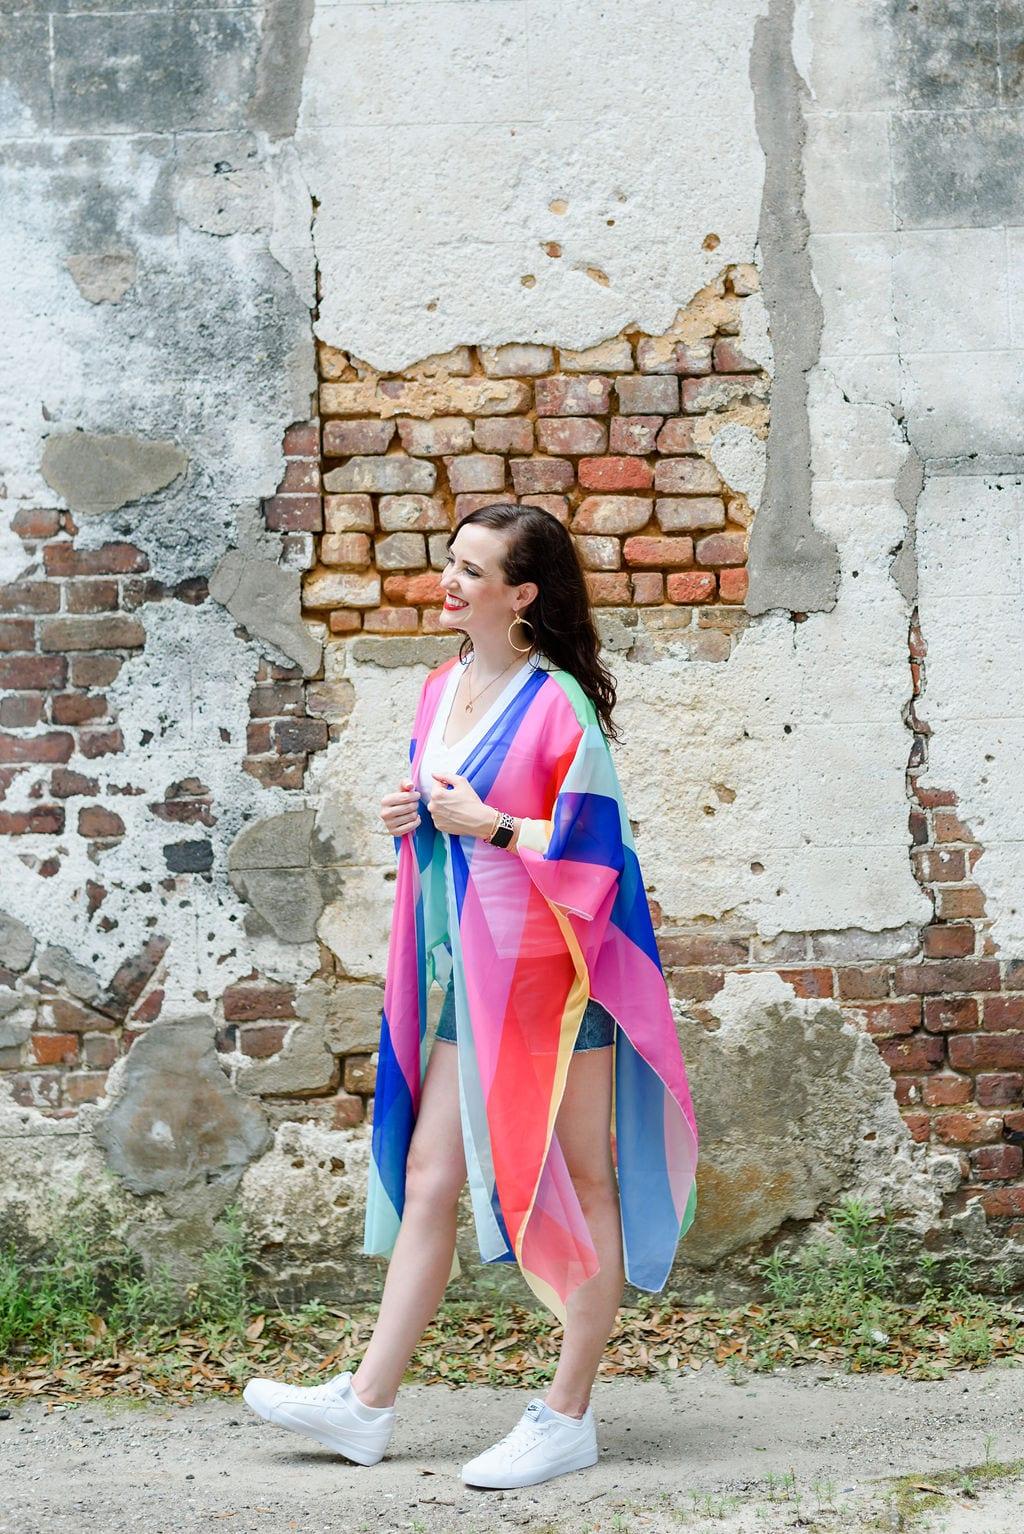 Ashley T wearing a rainbow kimono